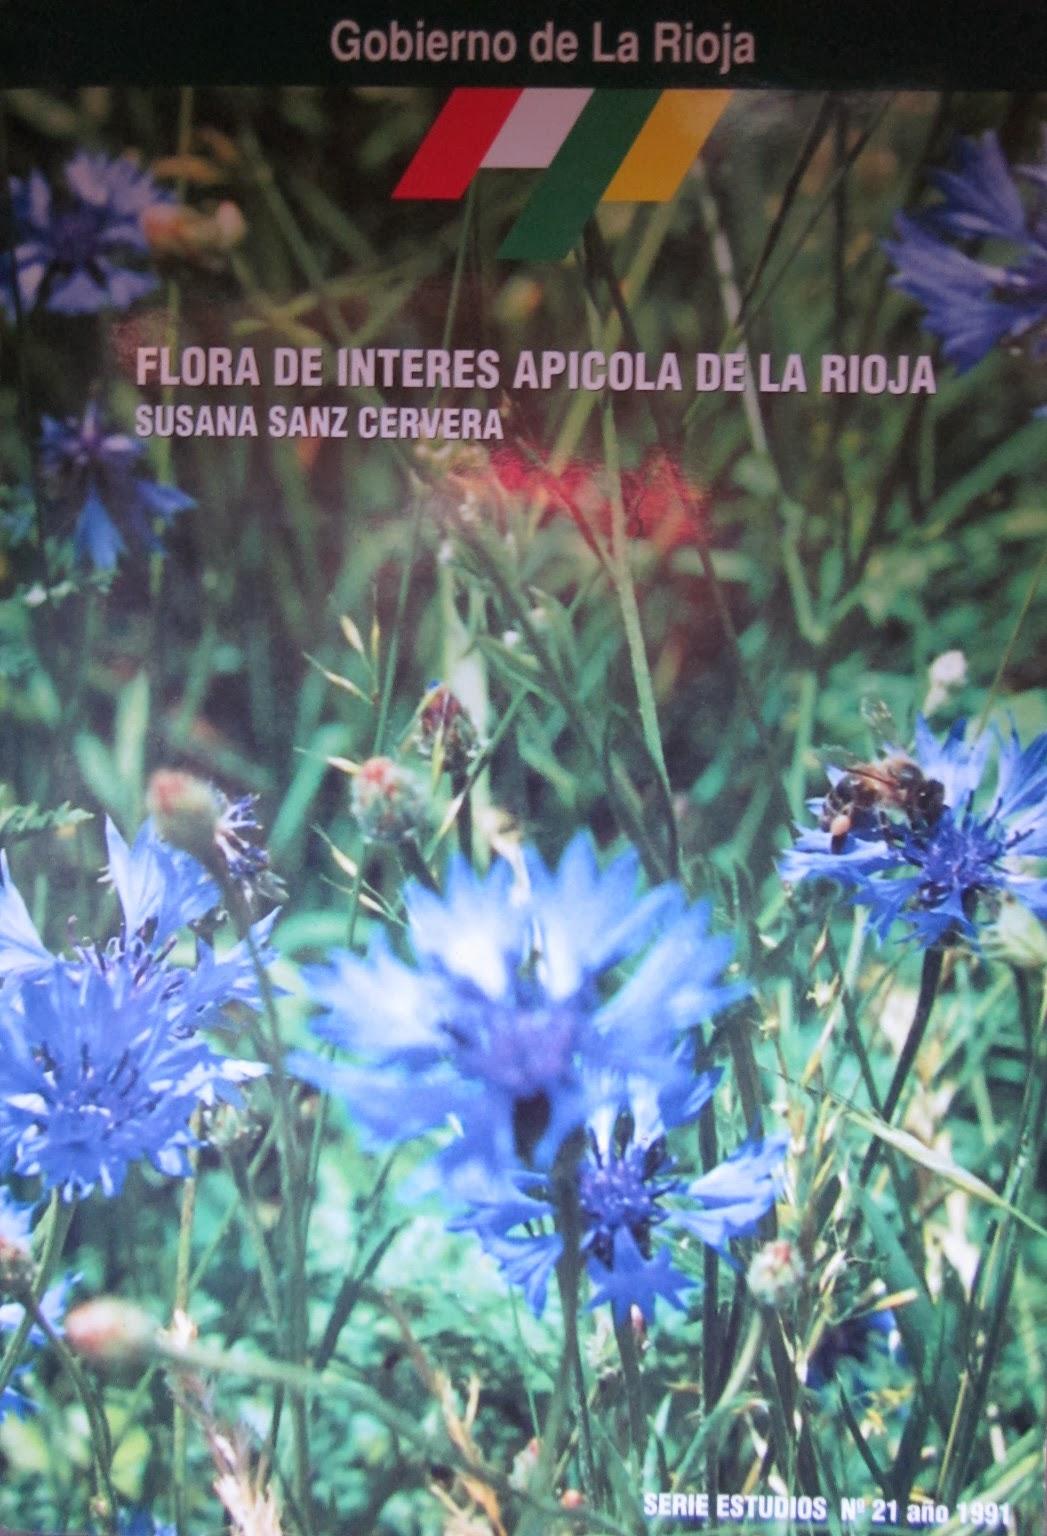 Sanz Cervera, Susana, Flora de interés apícola de La Rioja